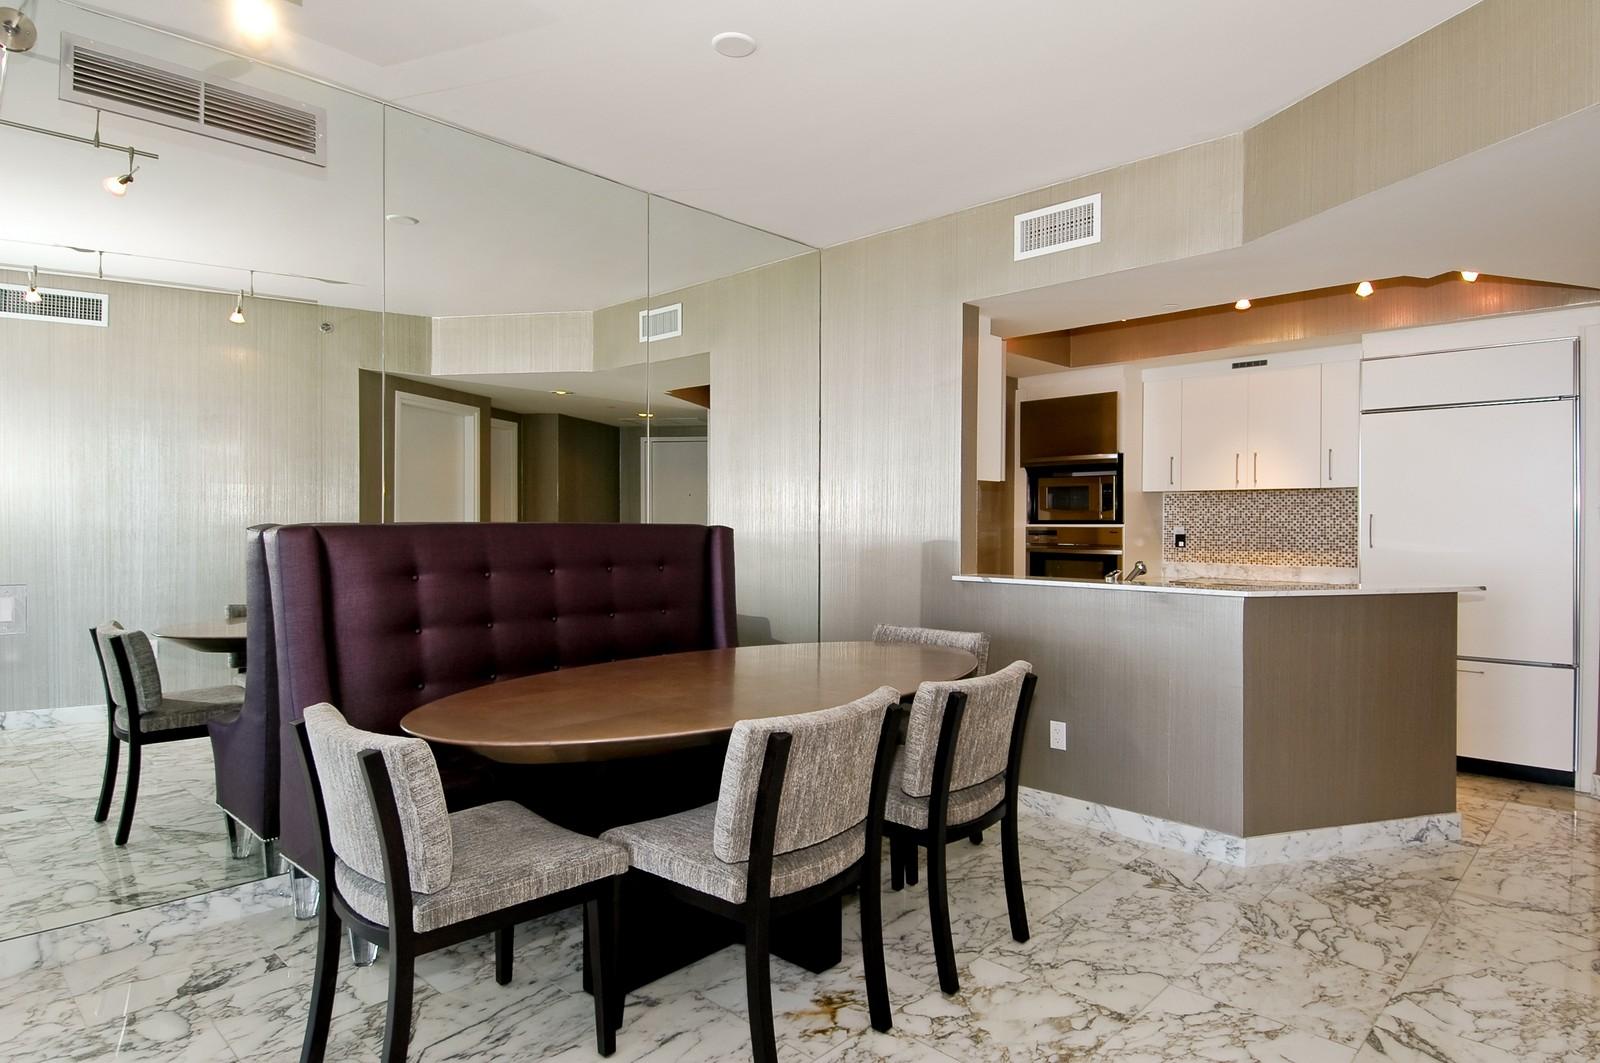 Real Estate Photography - 450 Alton Rd, Unit 2910, Miami Beach, FL, 33139 - Dining Room